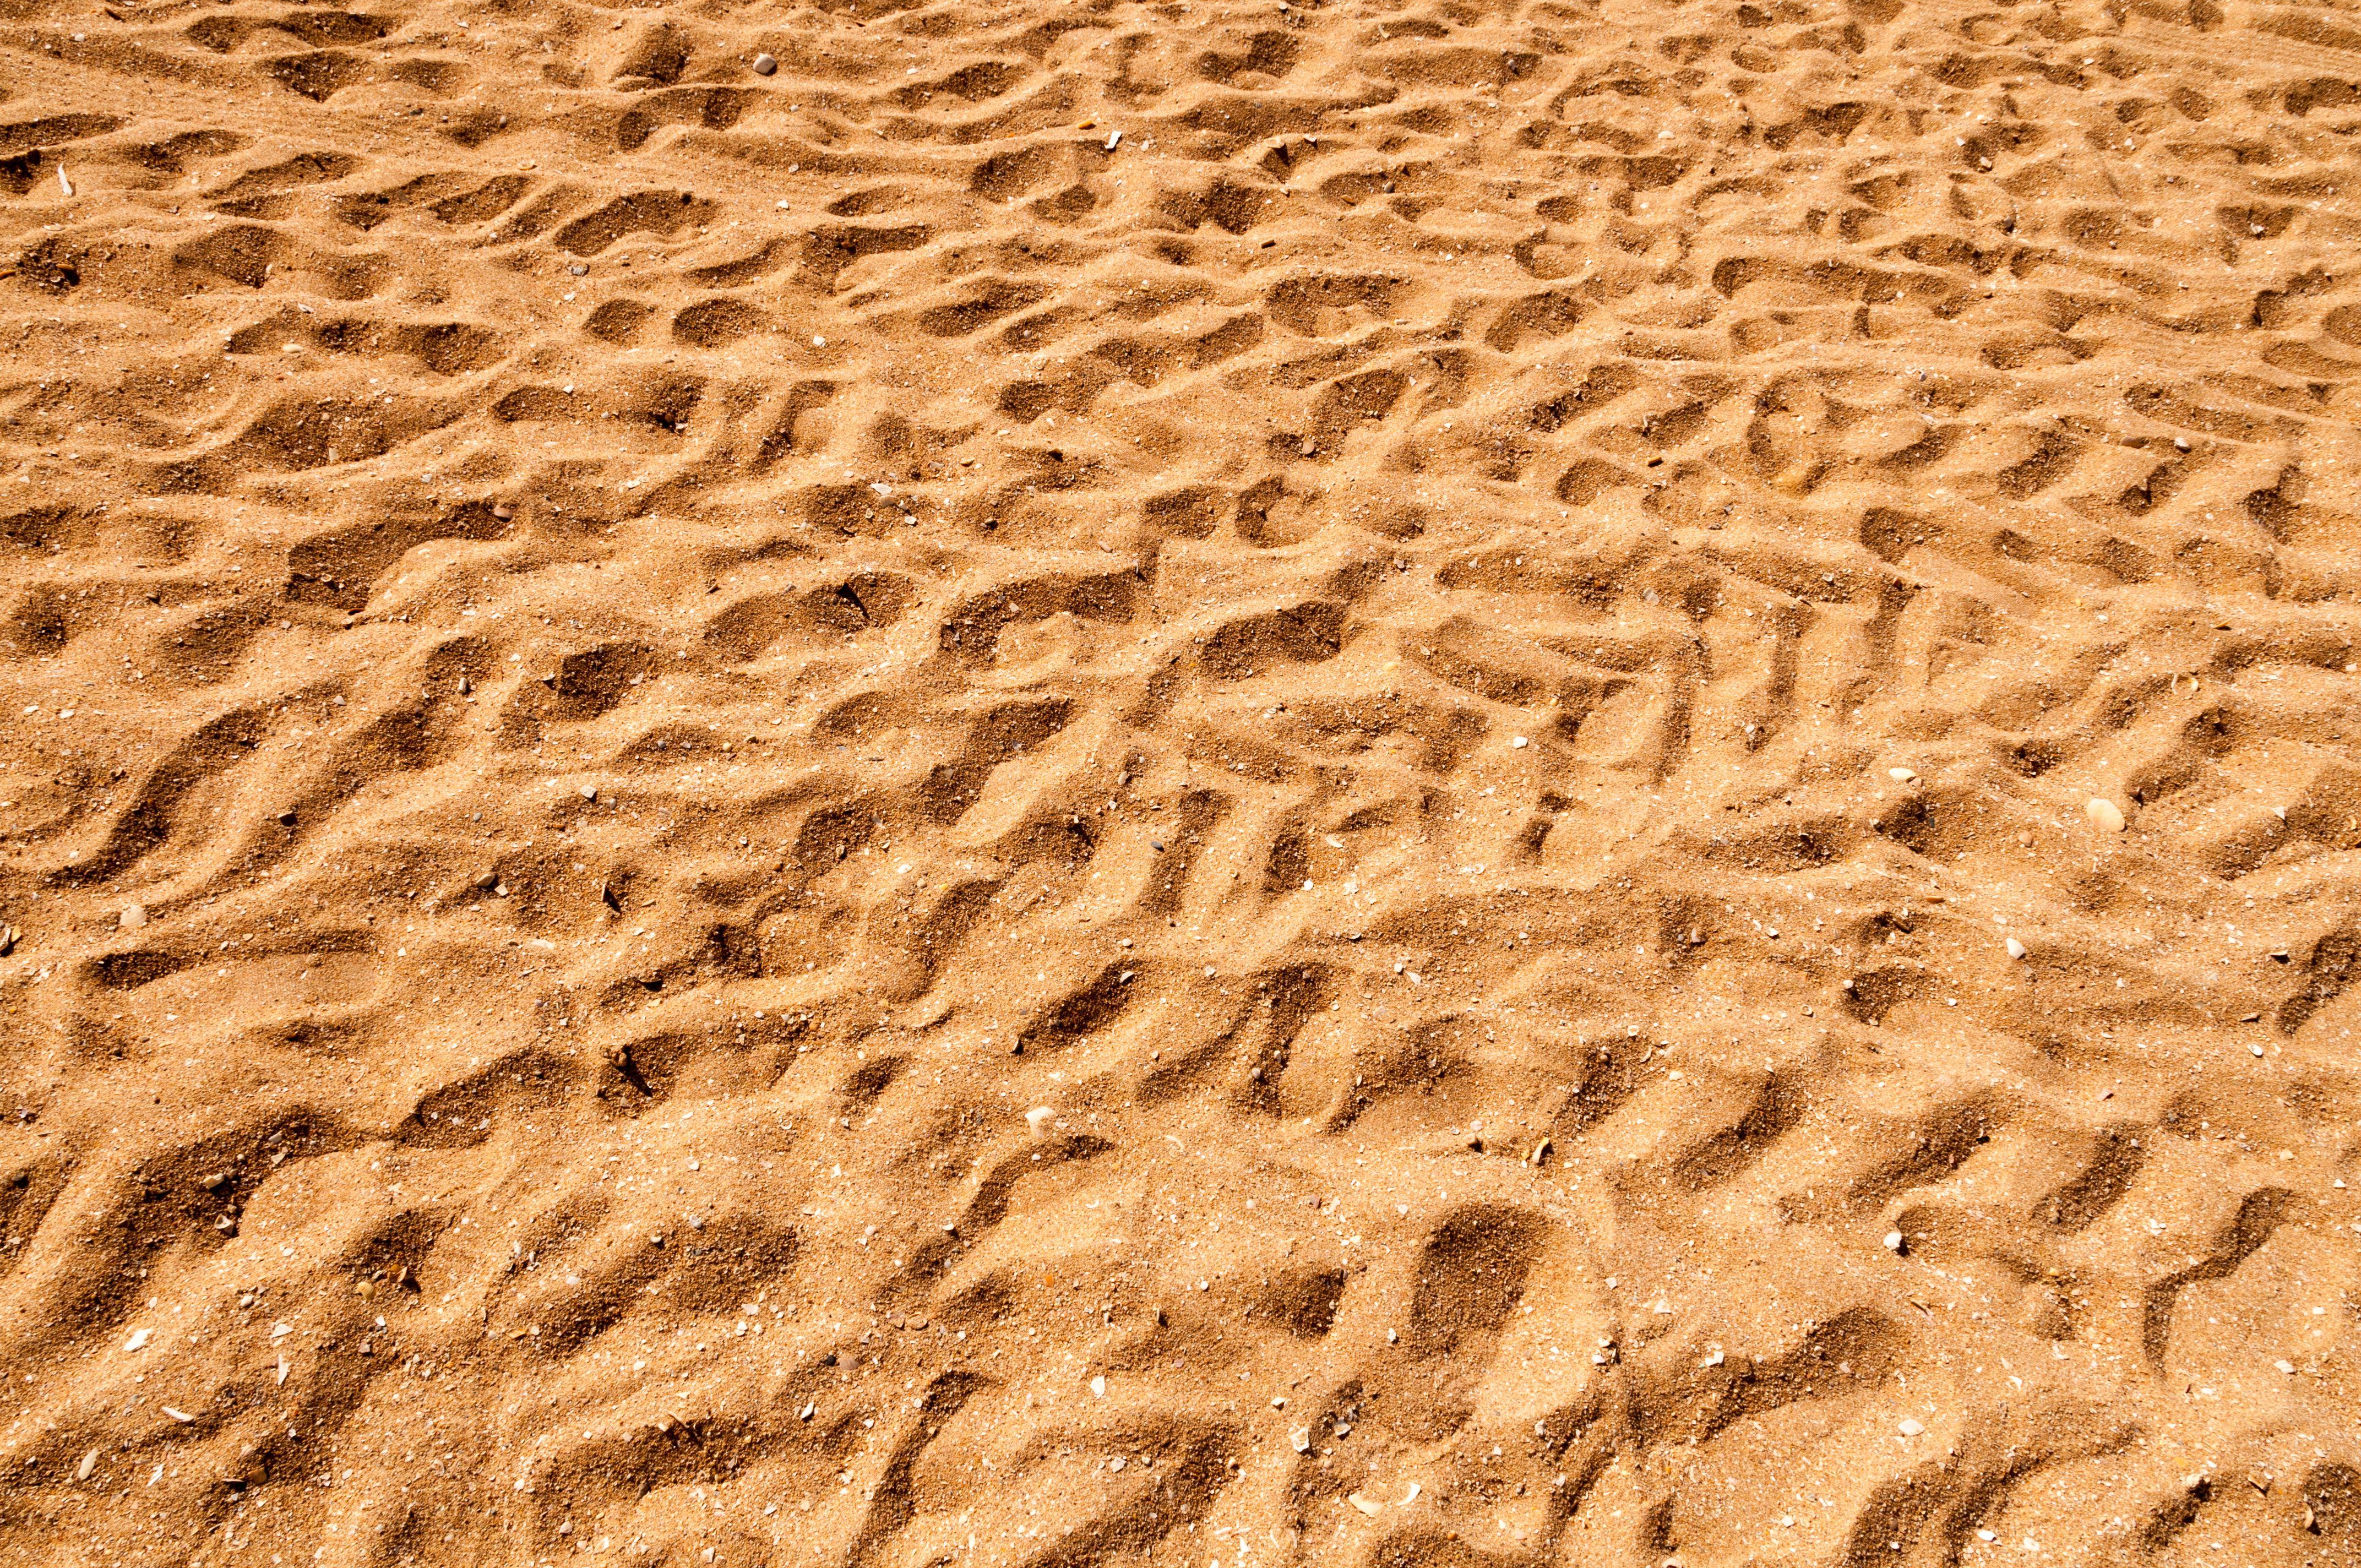 Pp05572013 Beach Sand Footsteps Texture Jpg 4288 2848 Texture